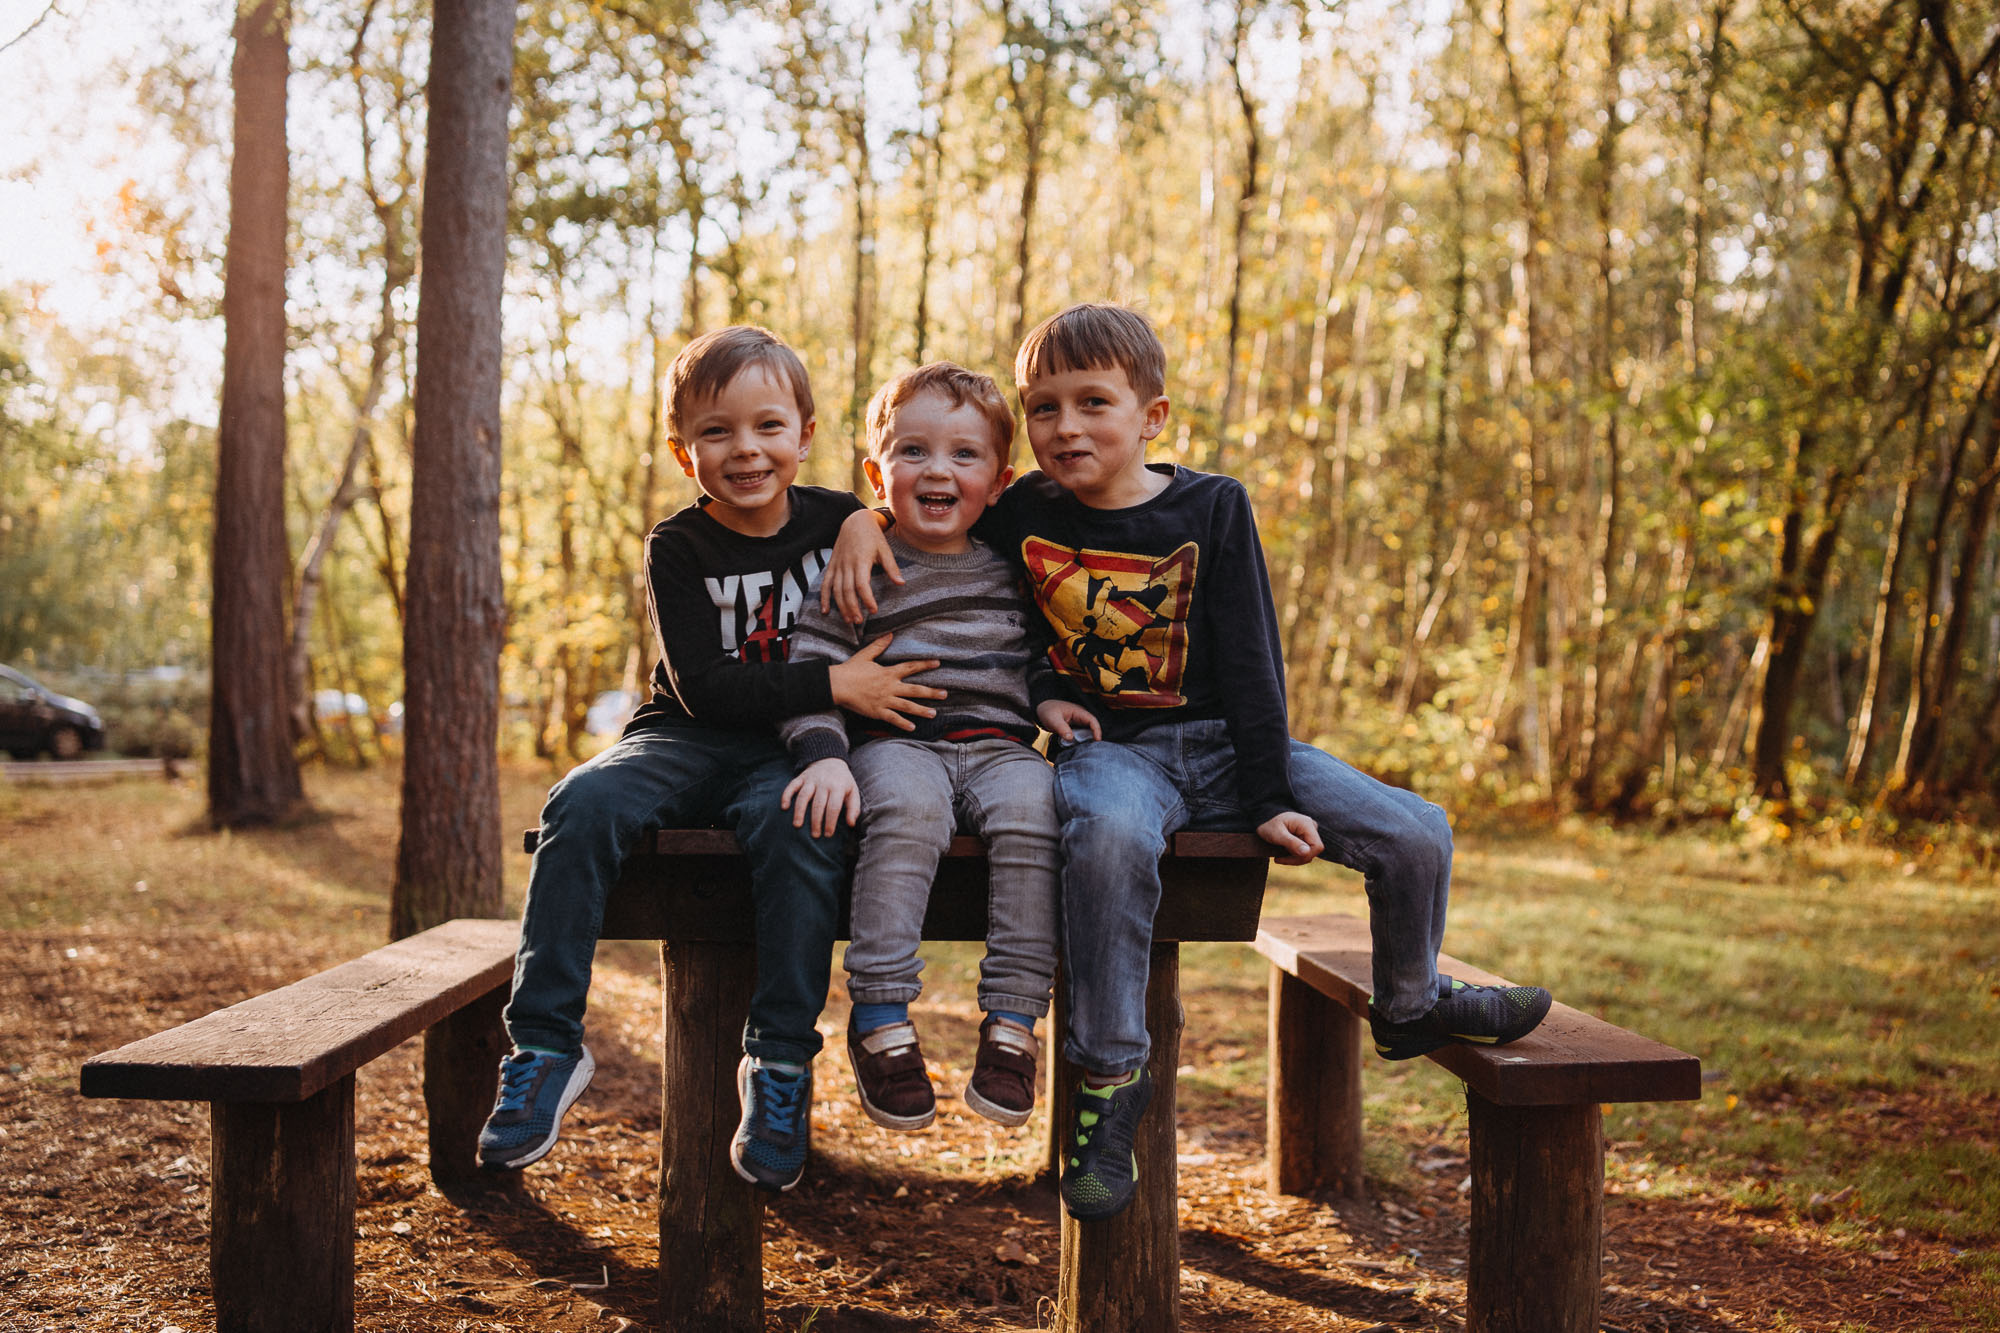 My favourite family portrait photos of 2018